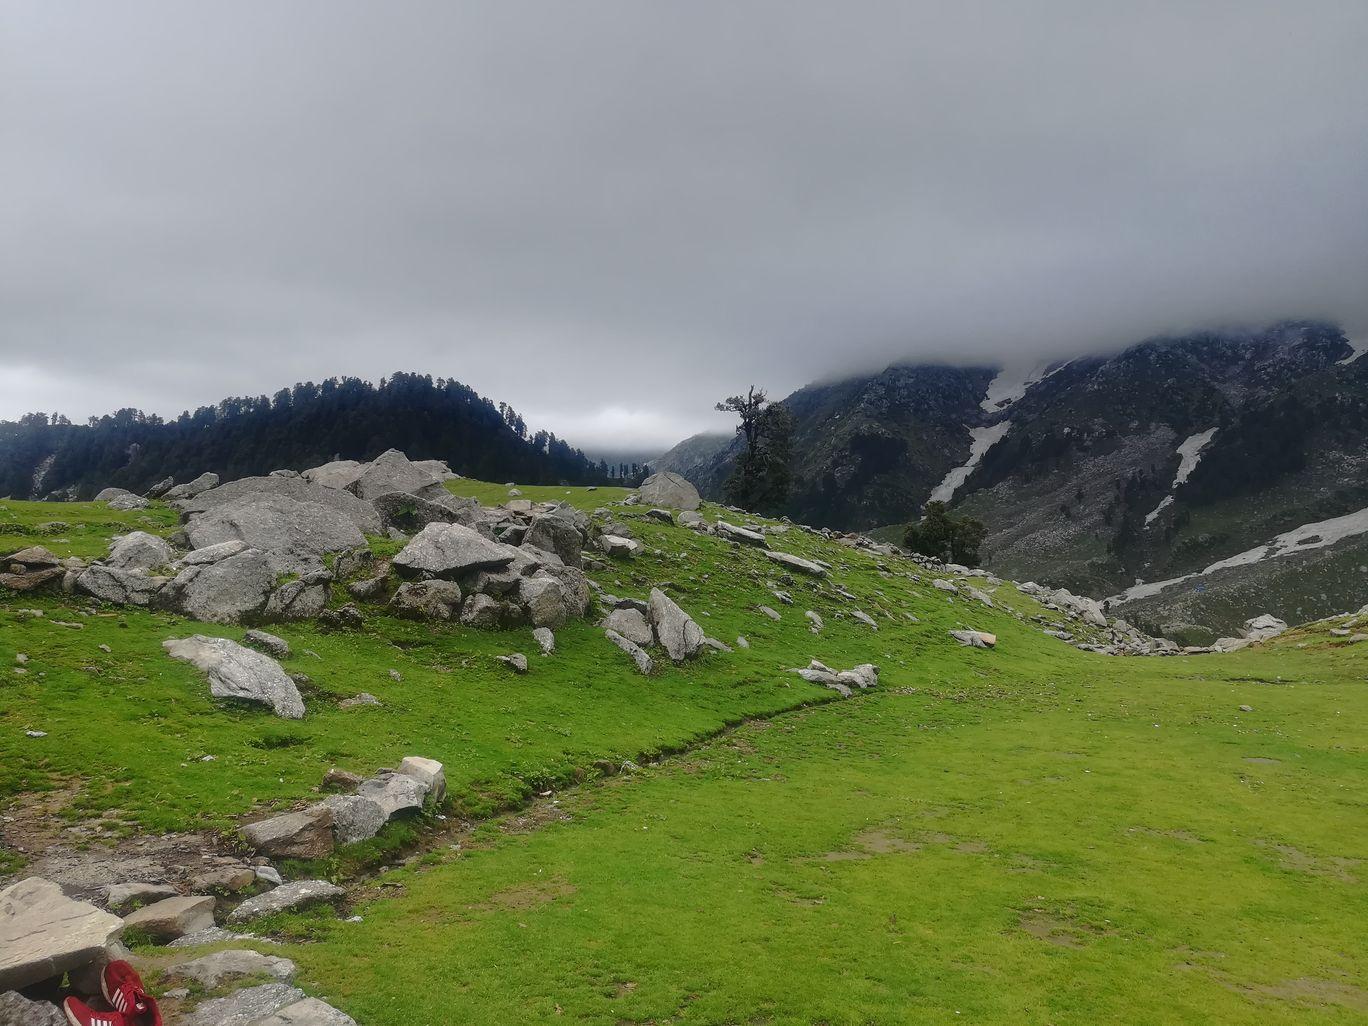 Photo of Kareri Lake By Ashutosh